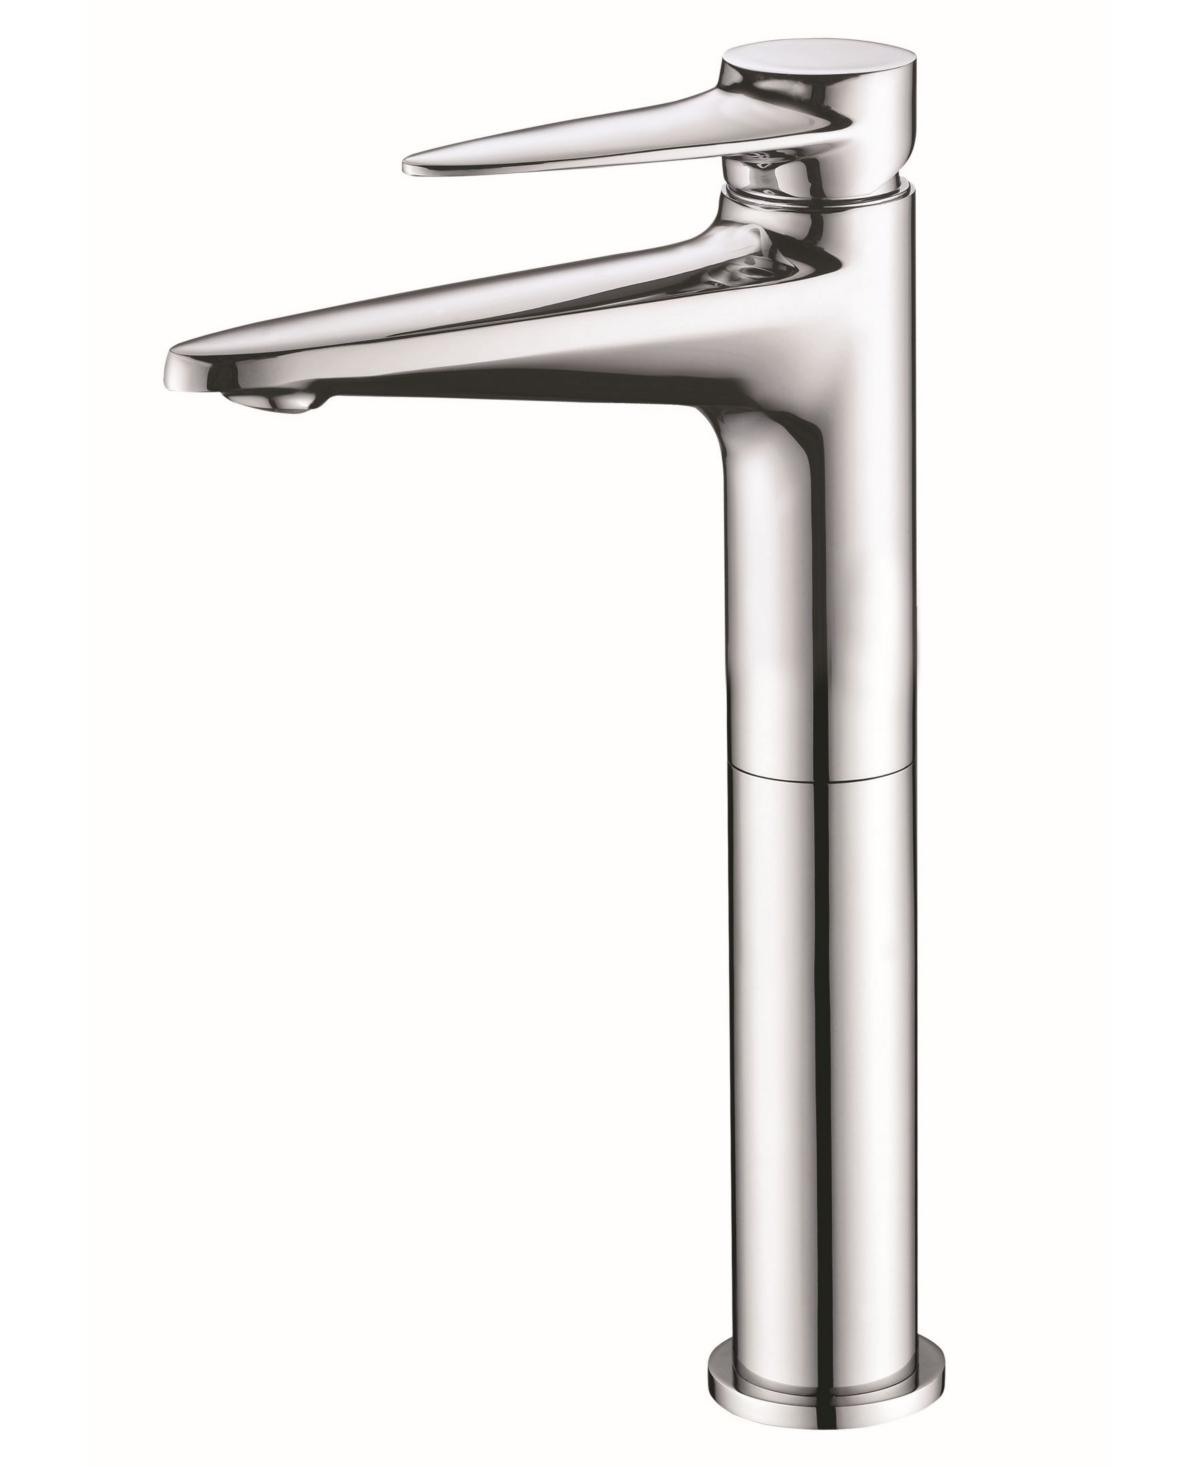 Alfi brand Polished Chrome Tall Single Hole Bathroom Faucet Bedding